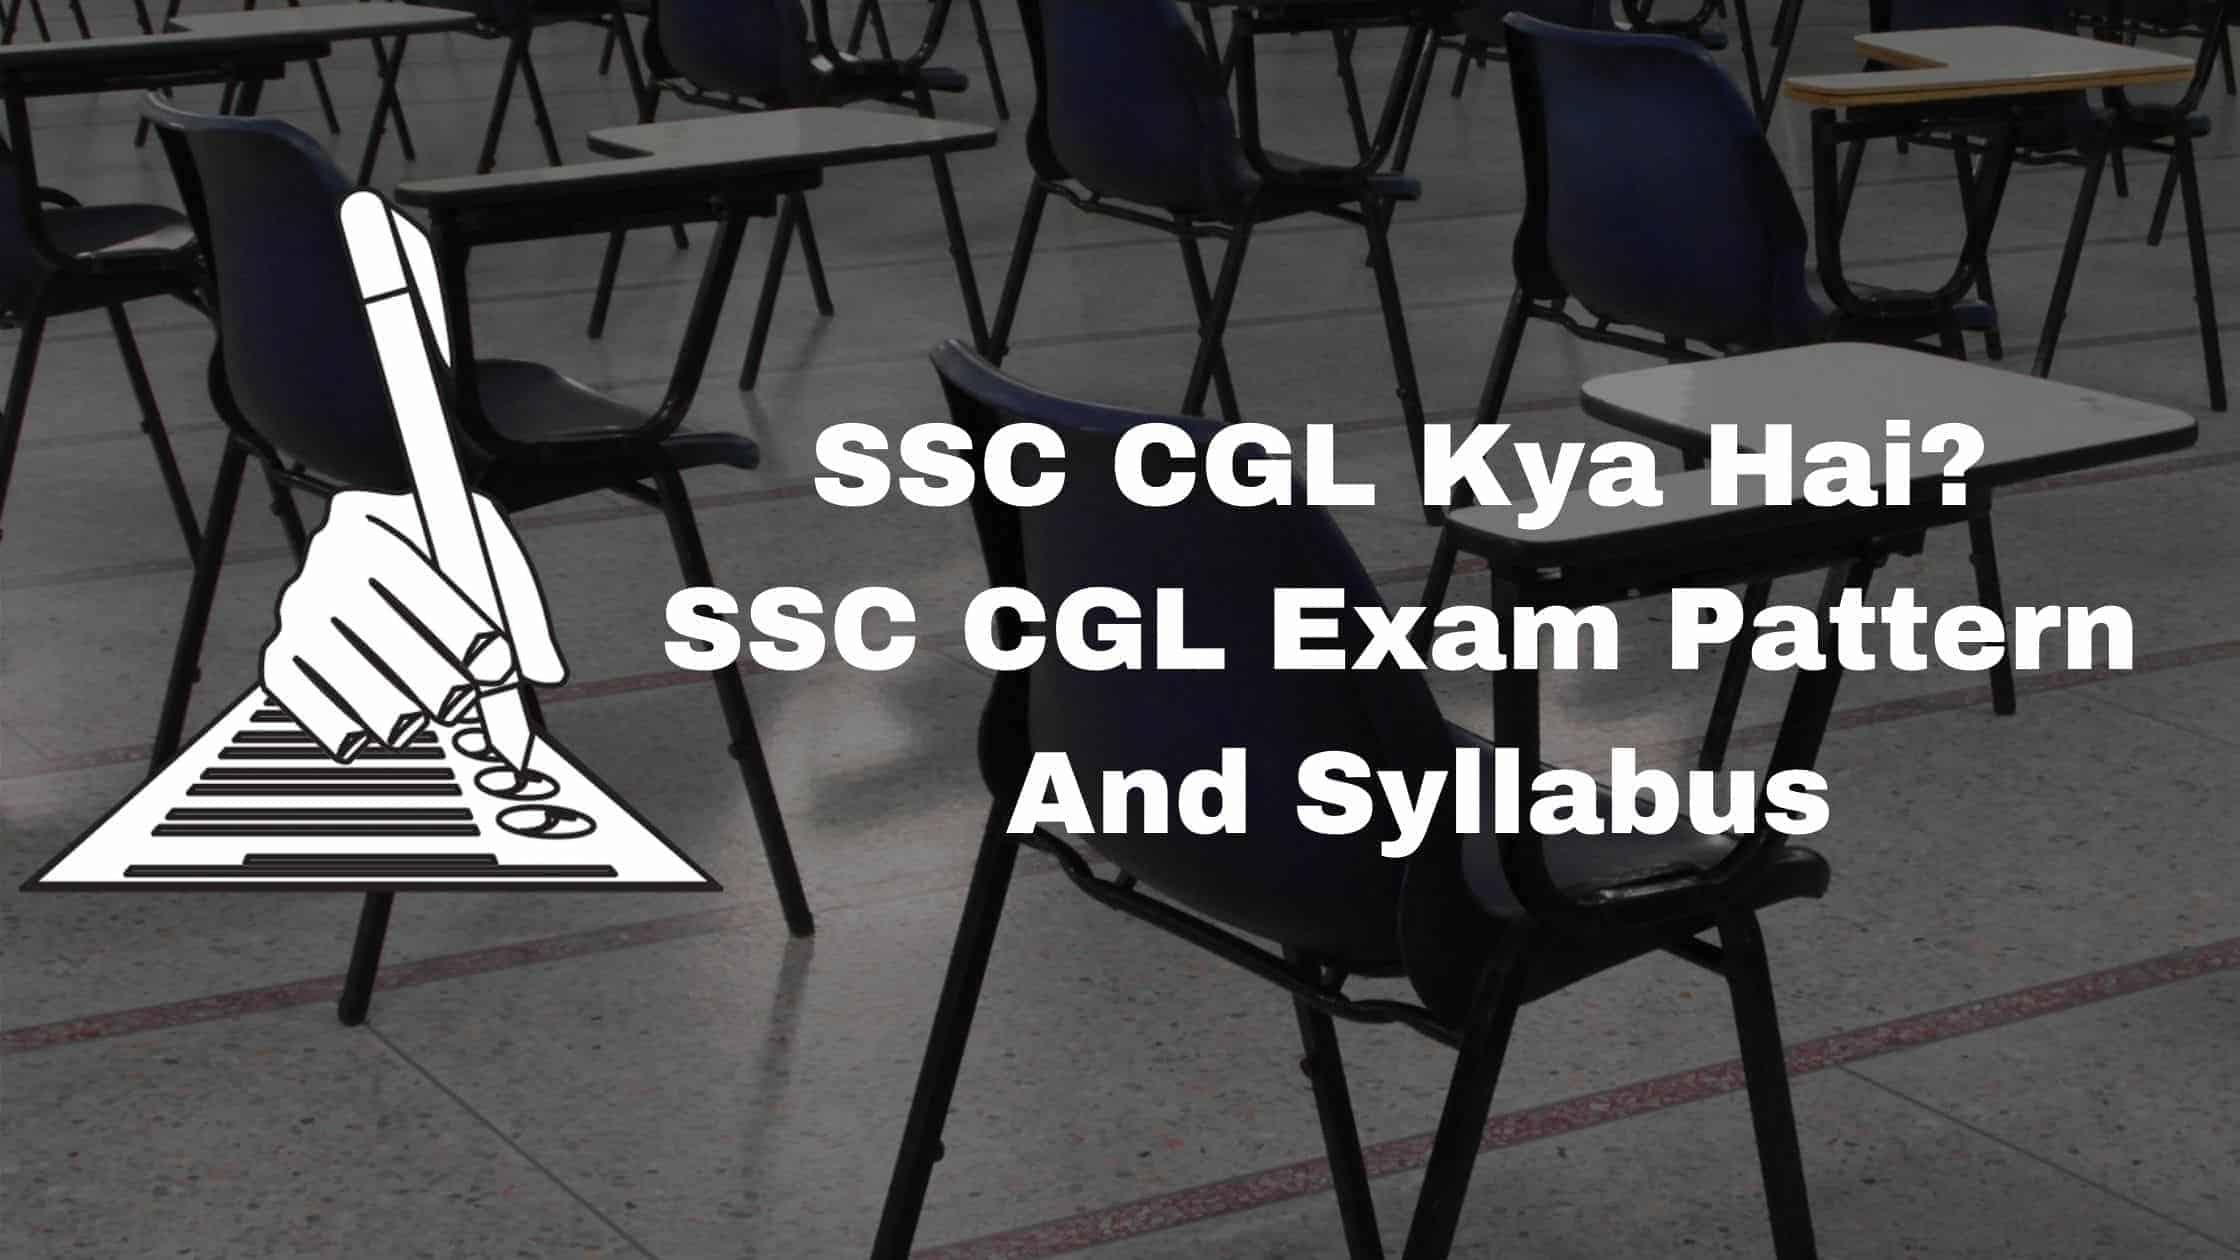 SSC CGL Kya Hai? SSC CGL Exam Pattern And Syllabus